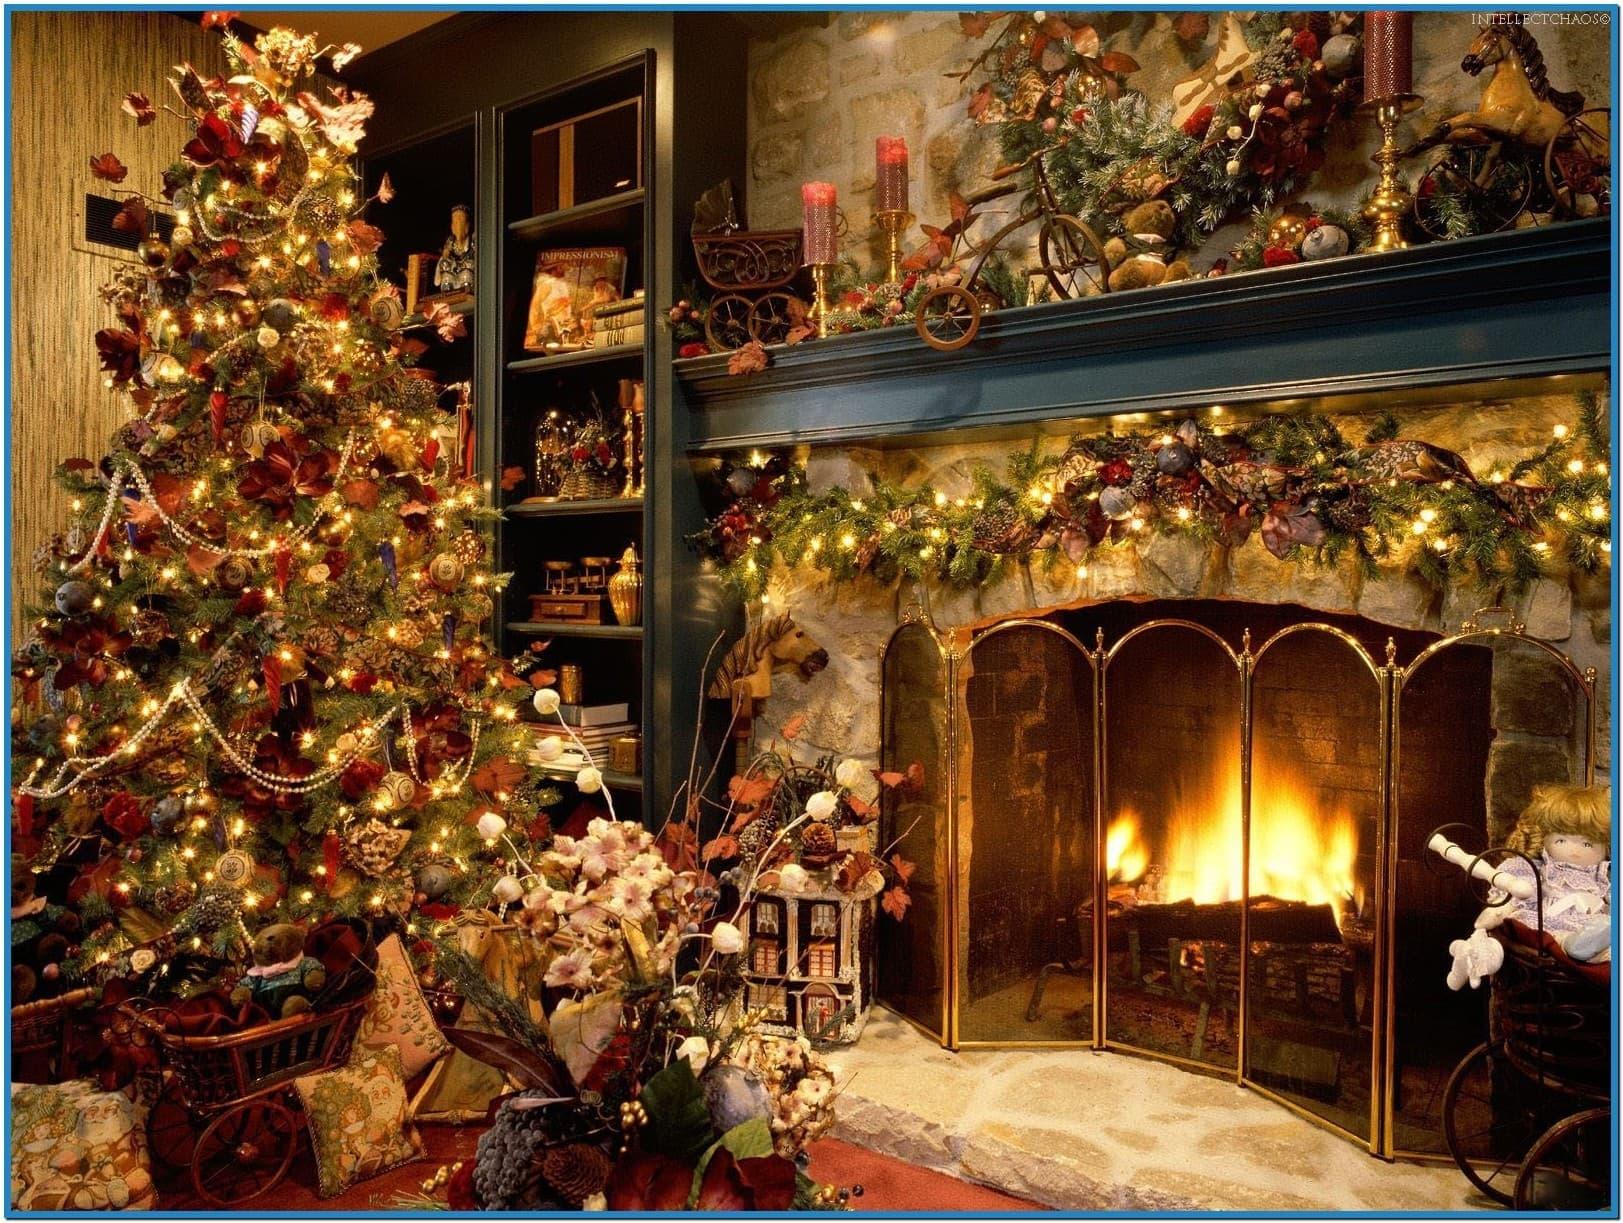 Holiday screensavers and wallpaper   Download 1623x1223